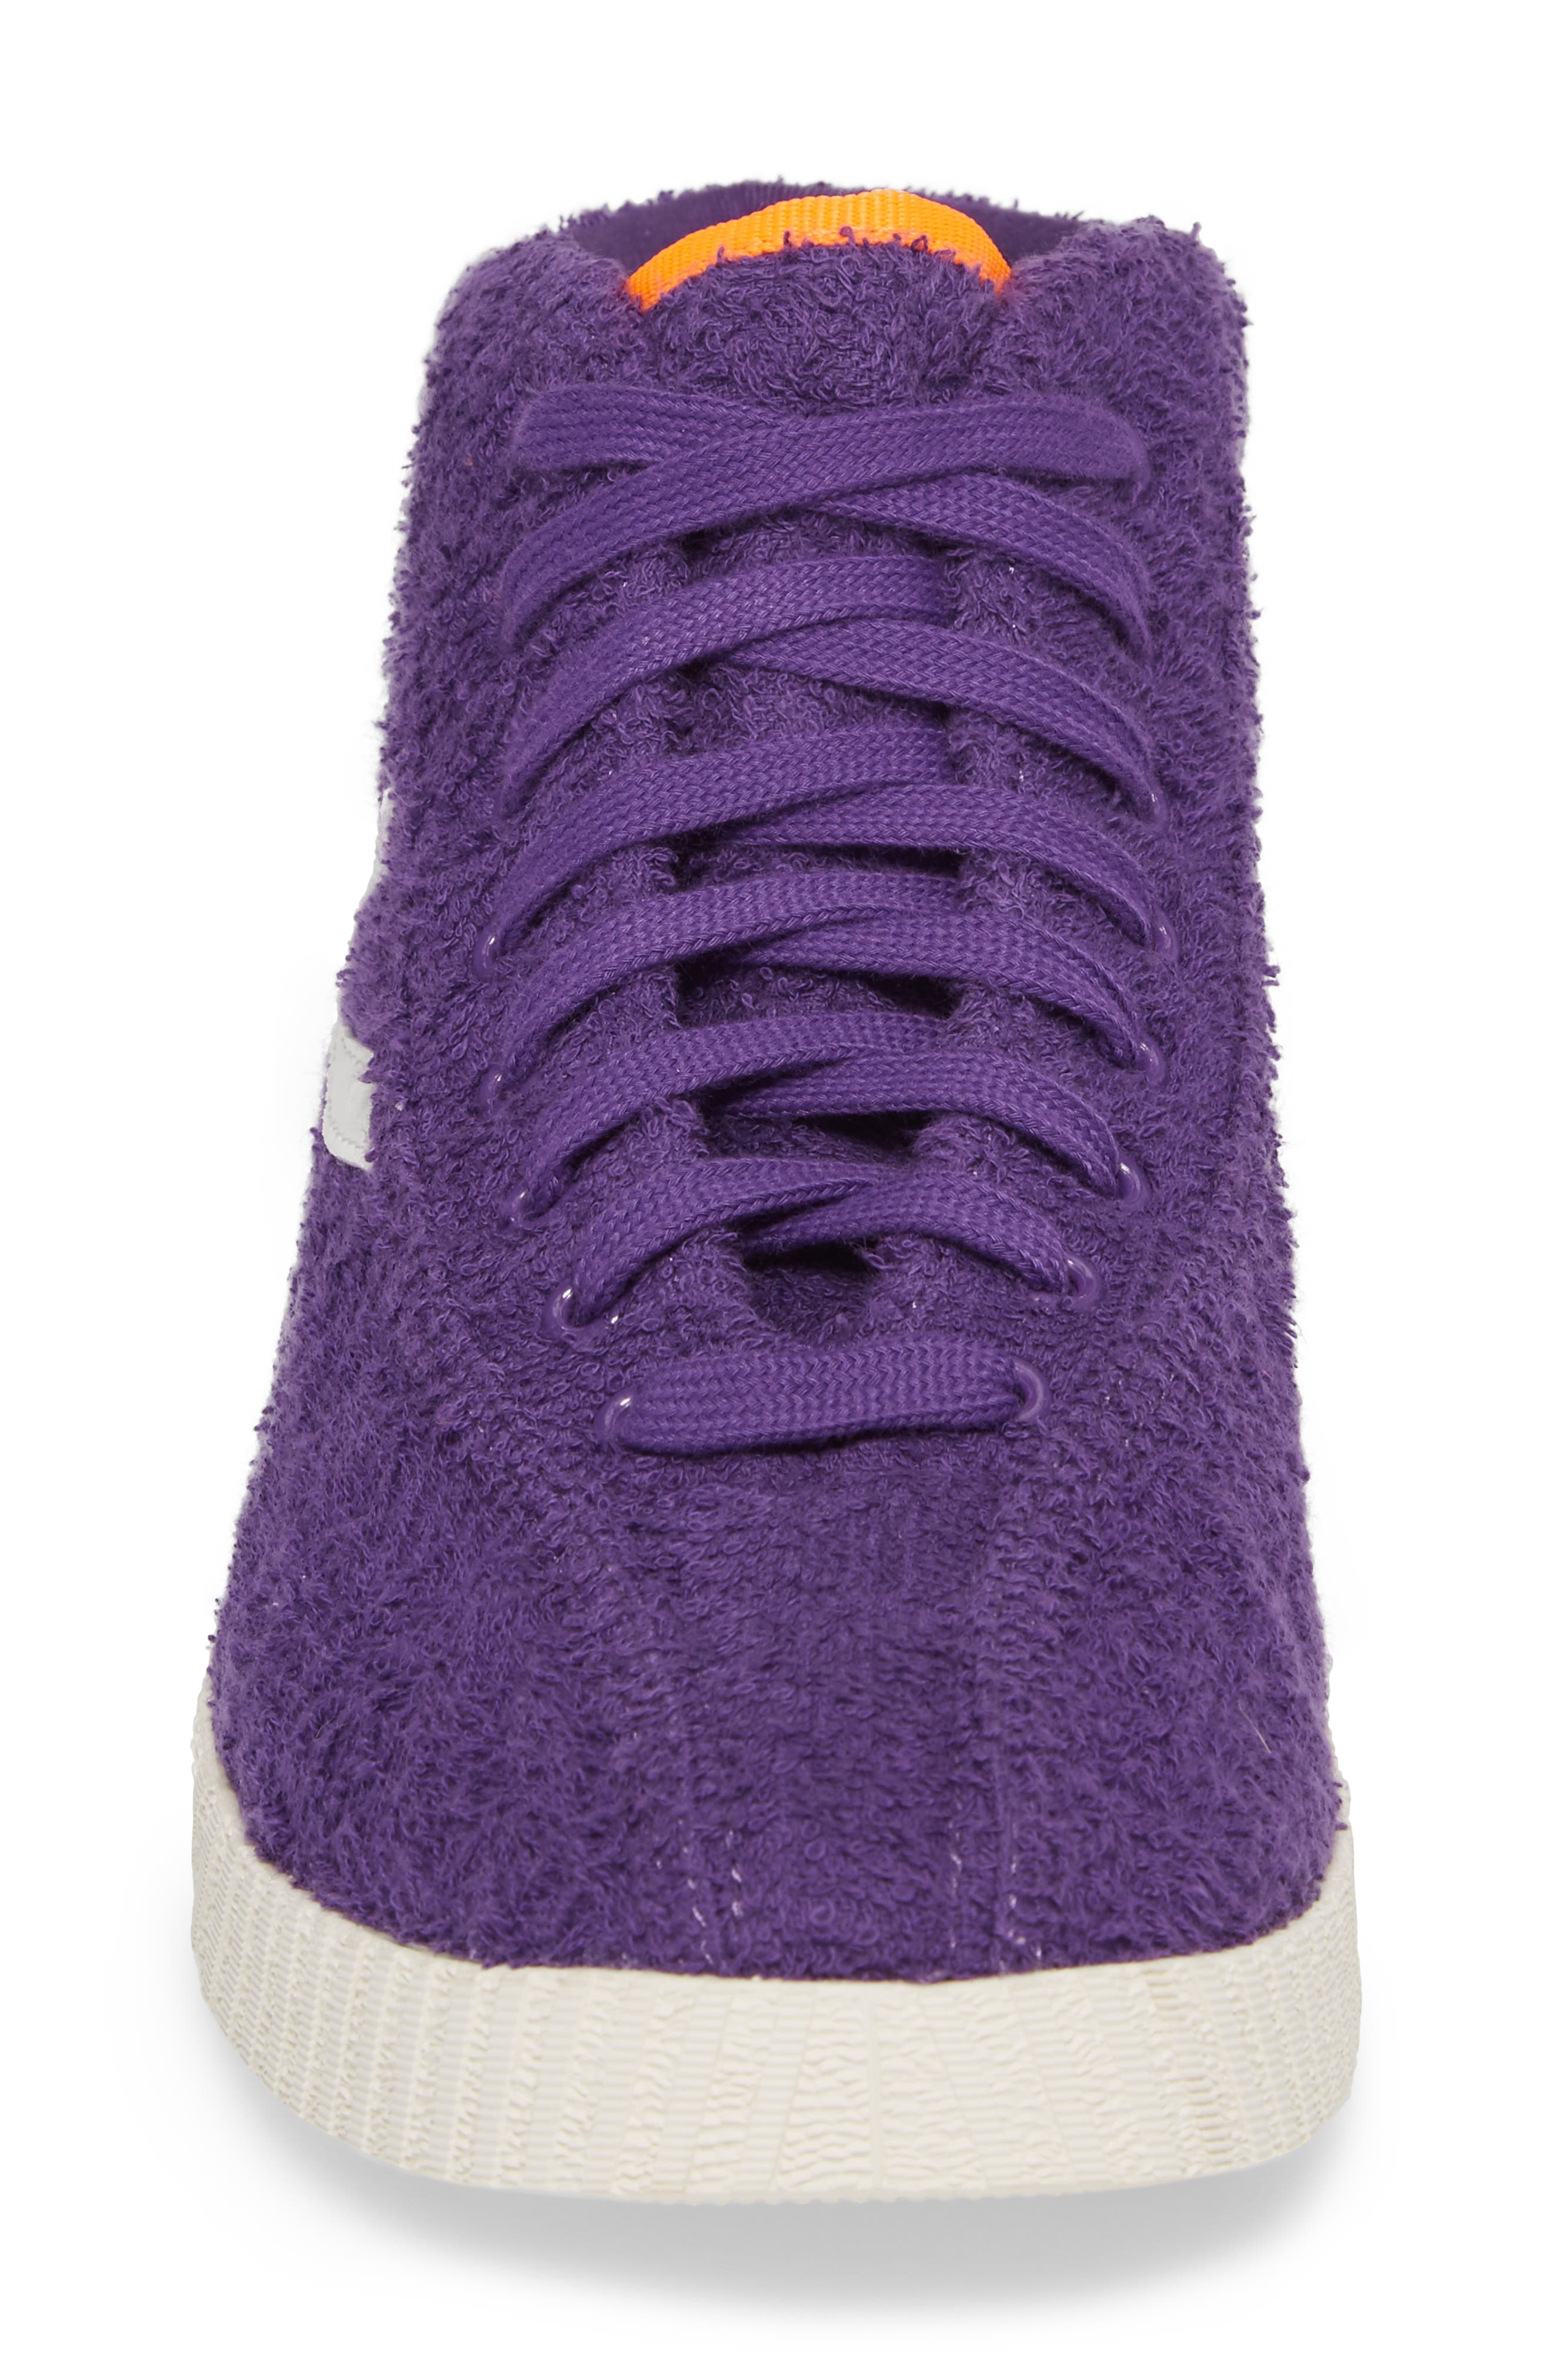 Andre 3000 Nylite High Top Sneaker,                             Alternate thumbnail 4, color,                             Vibrant Purple/ Vintage White